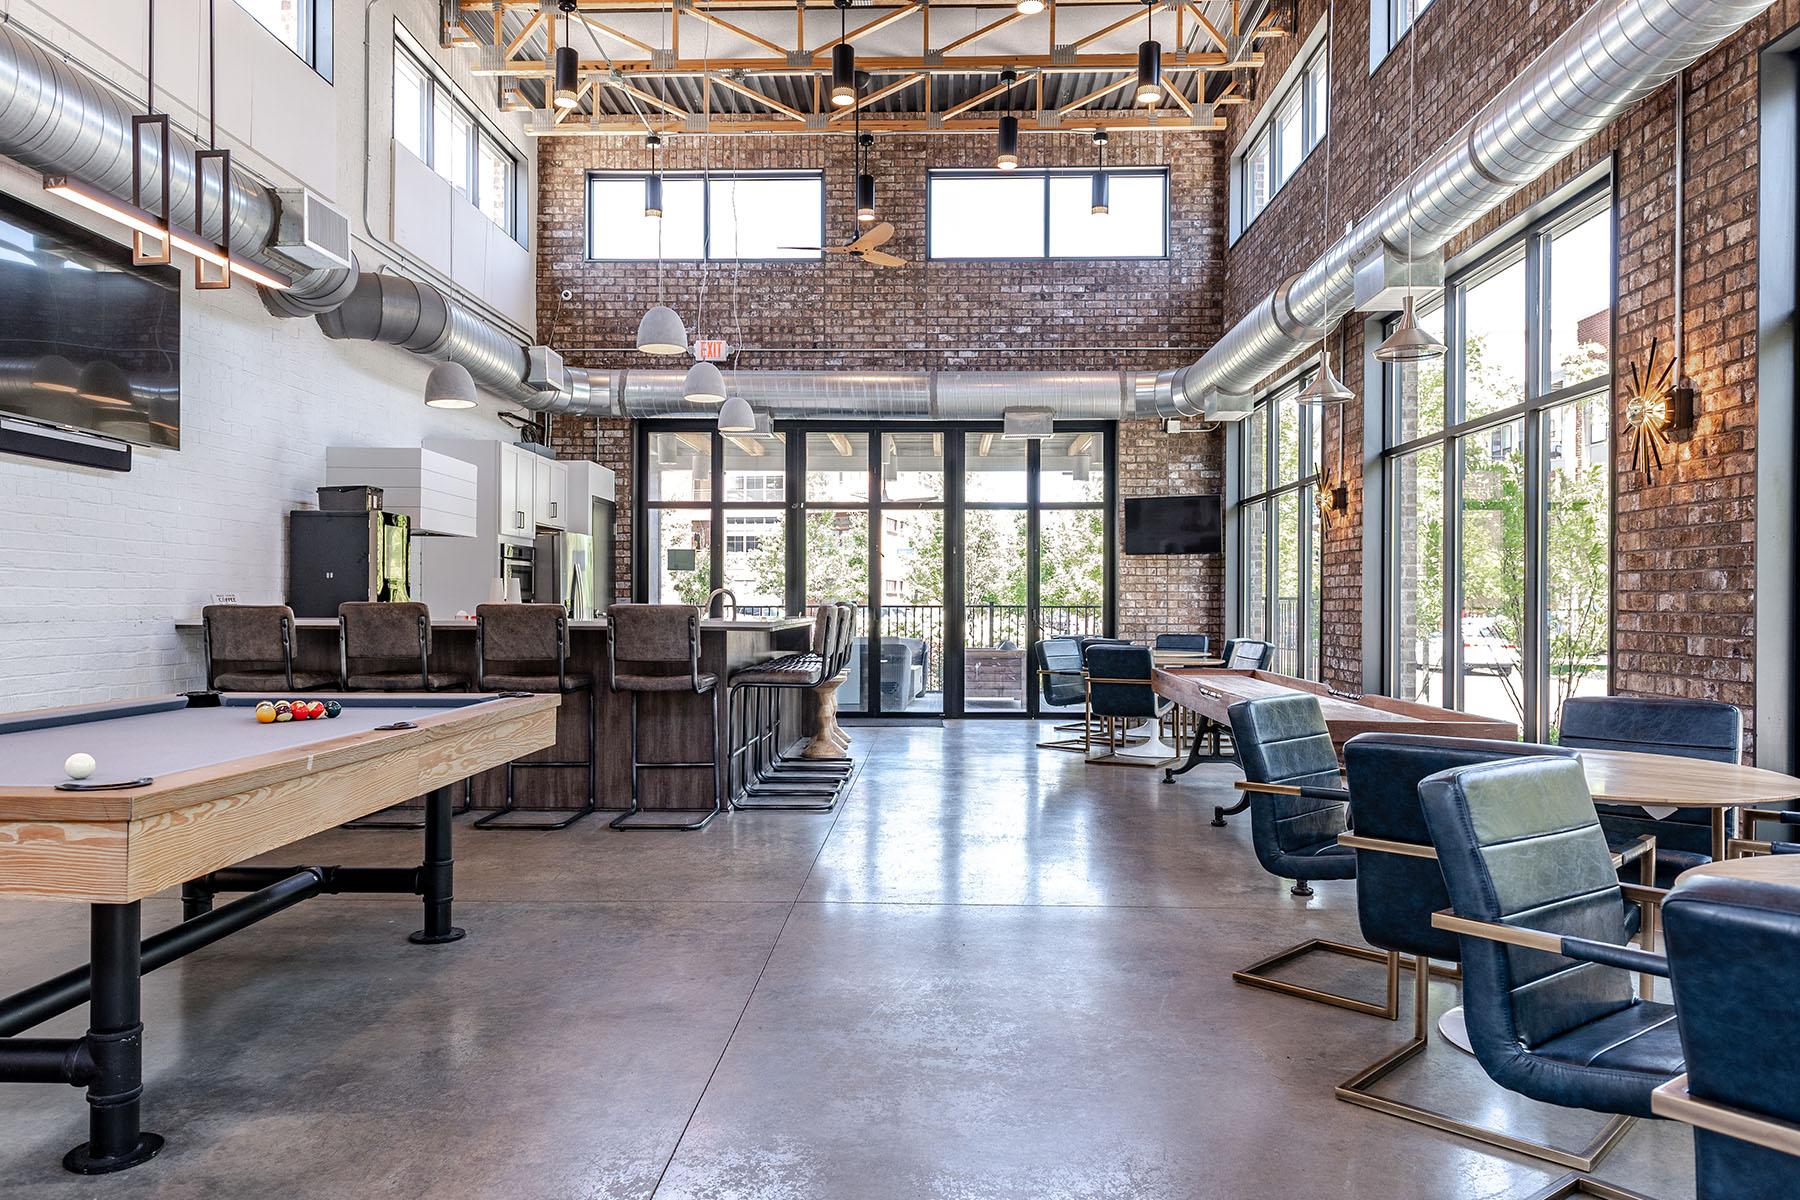 Community Room Image 1